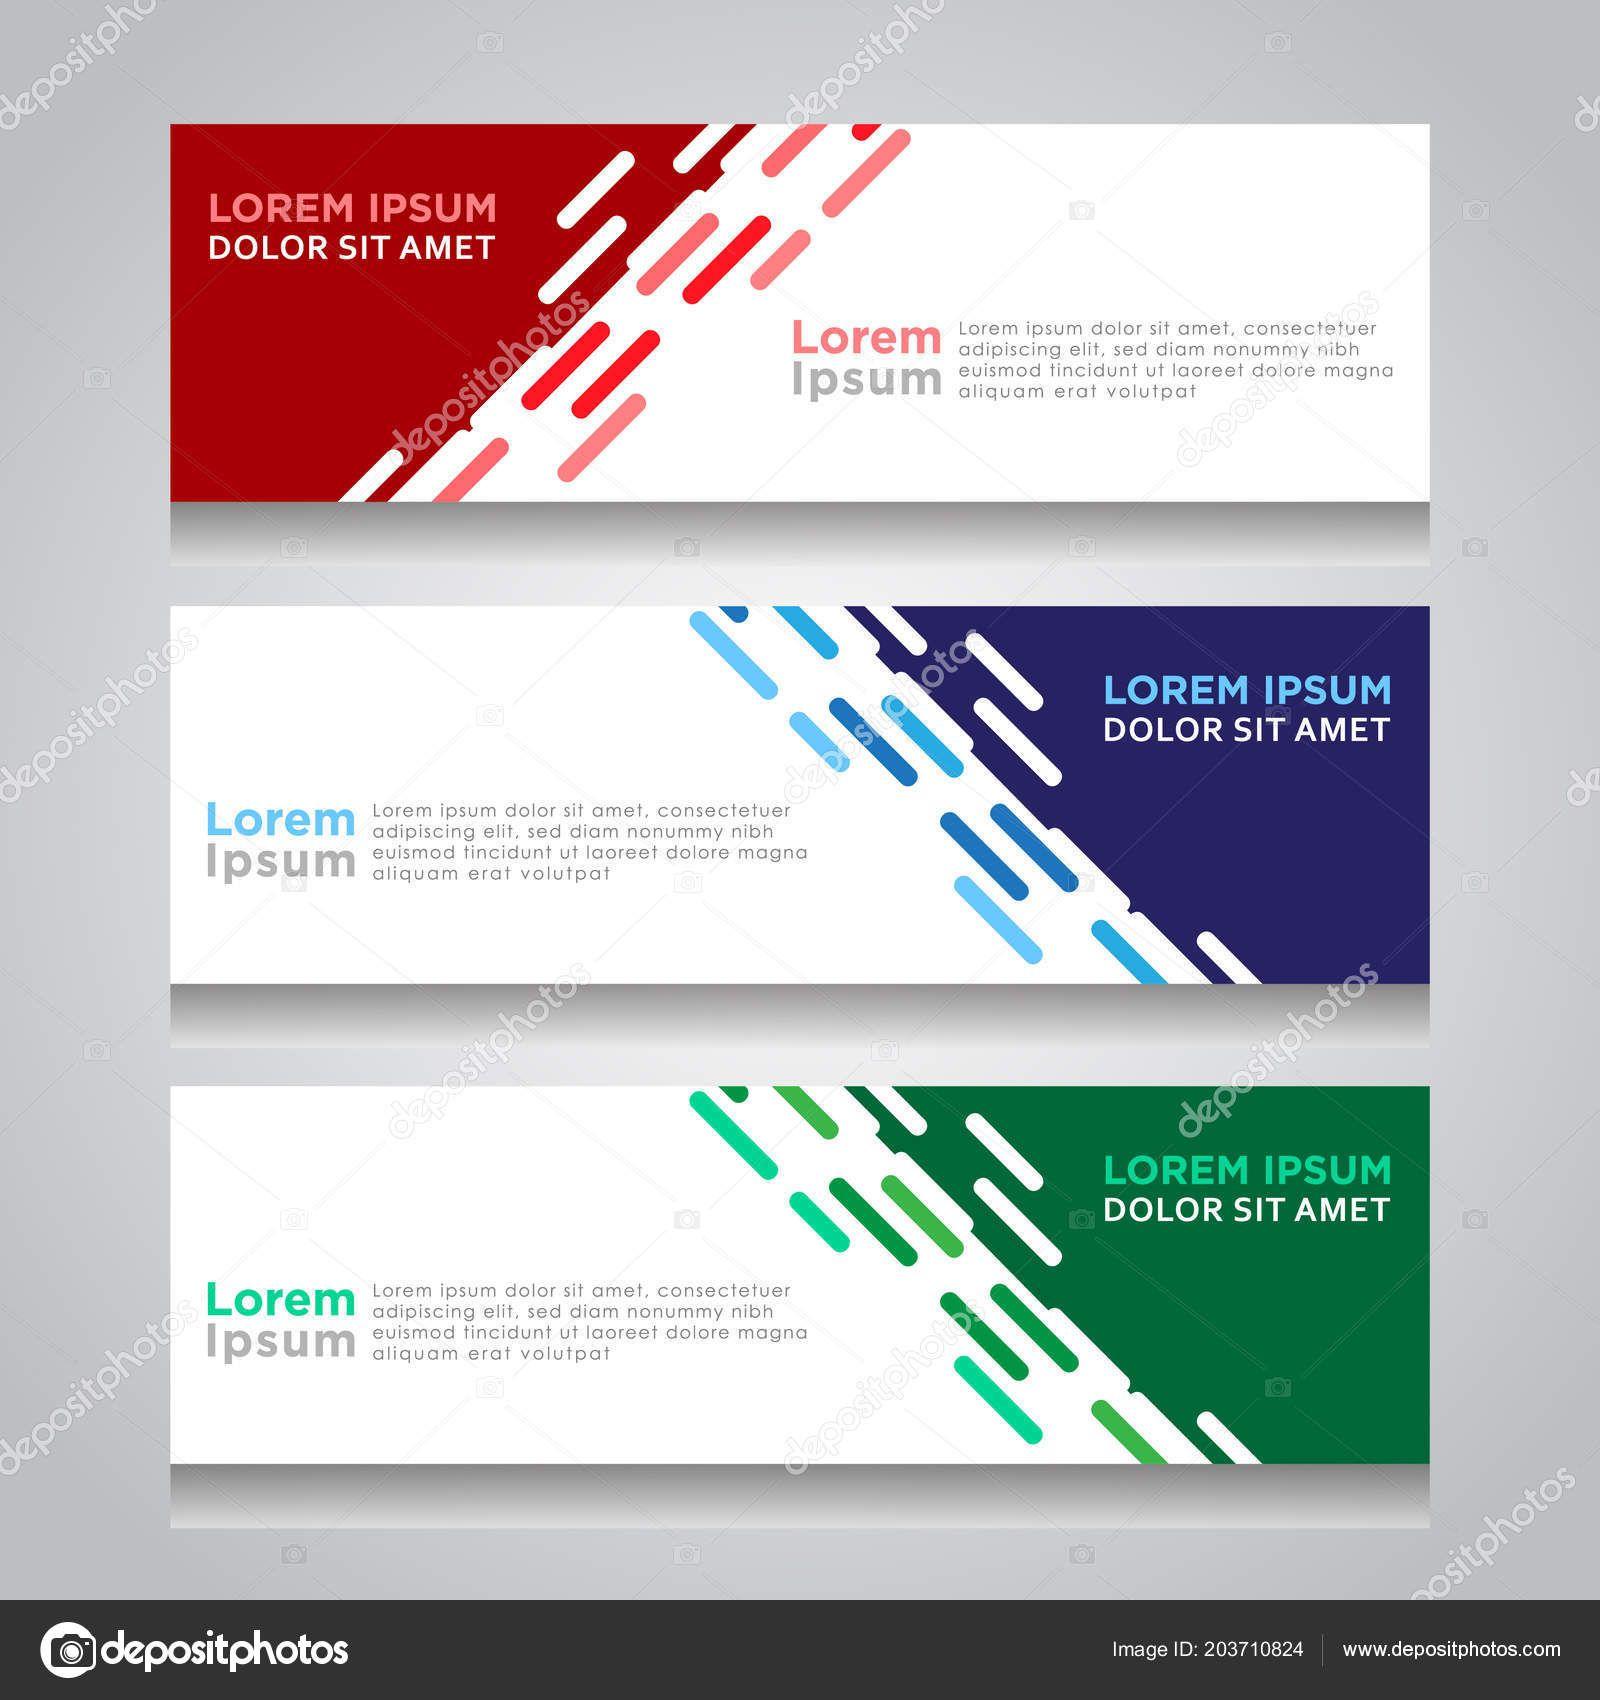 Vector Abstract Design Web Banner Template Web Design Regarding Website Banner Design Templates B In 2020 Banner Template Design Website Banner Design Website Banner